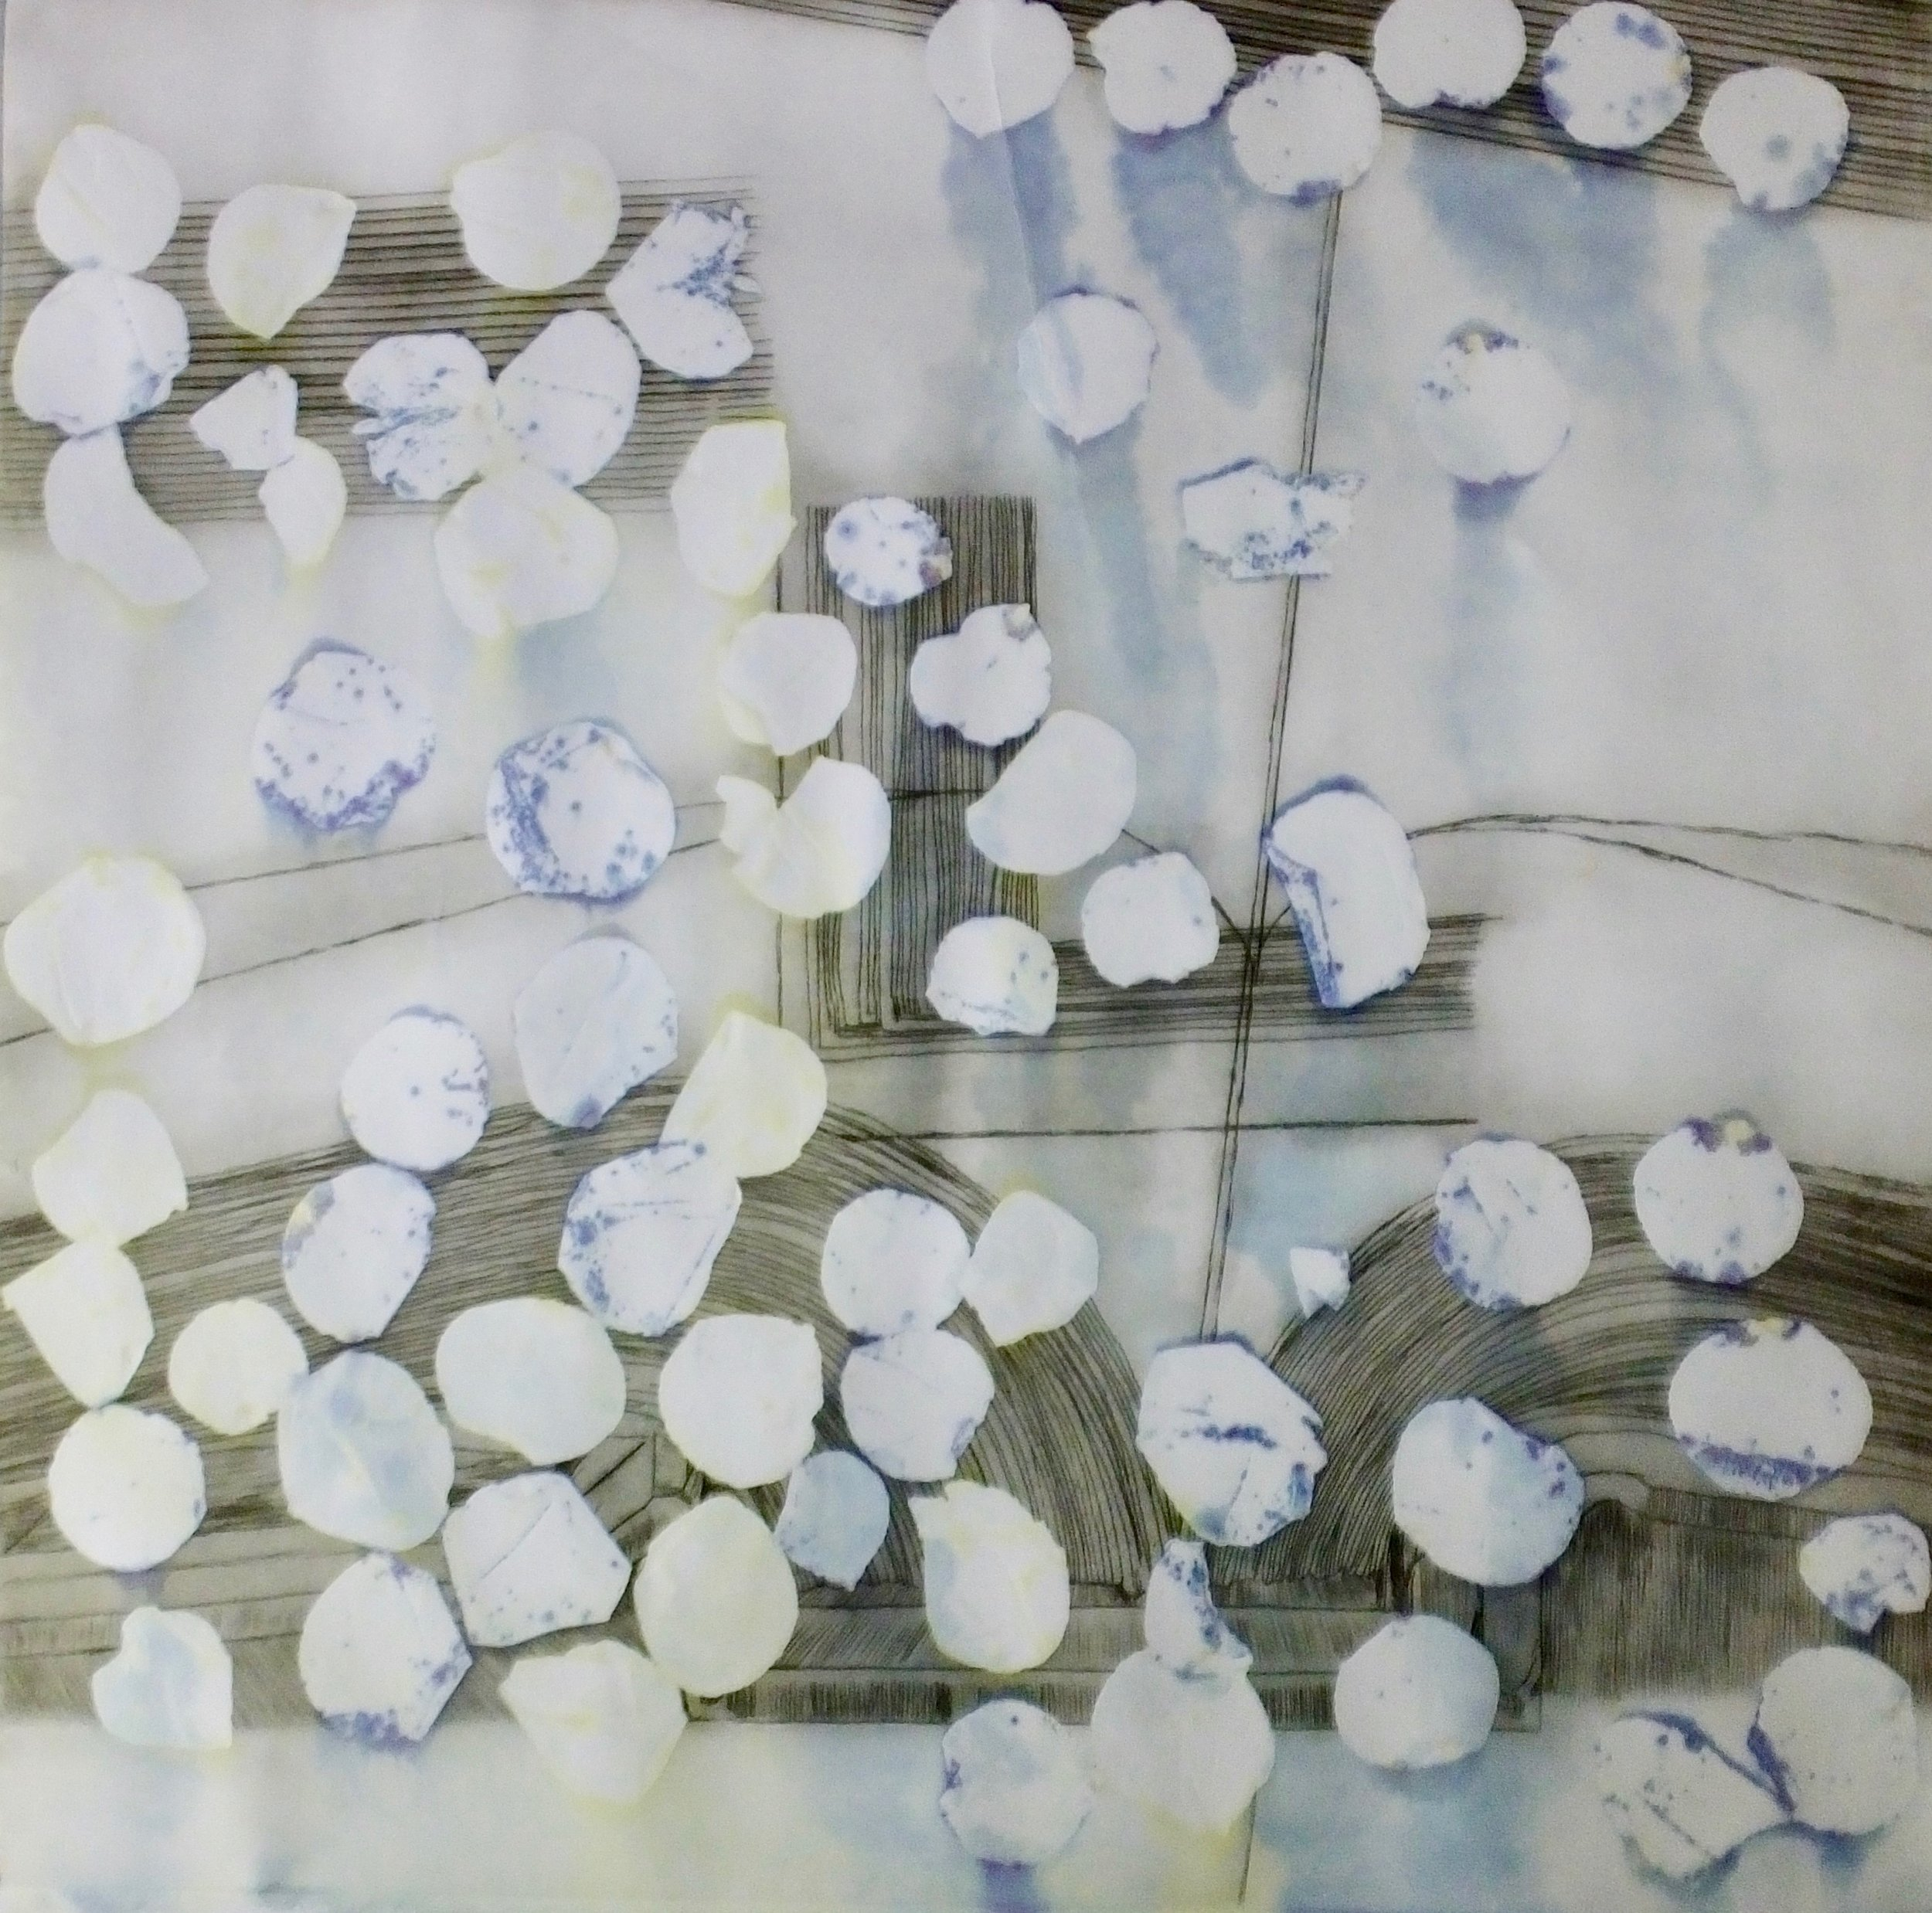 Archive P3. Rose Petal transfer etching